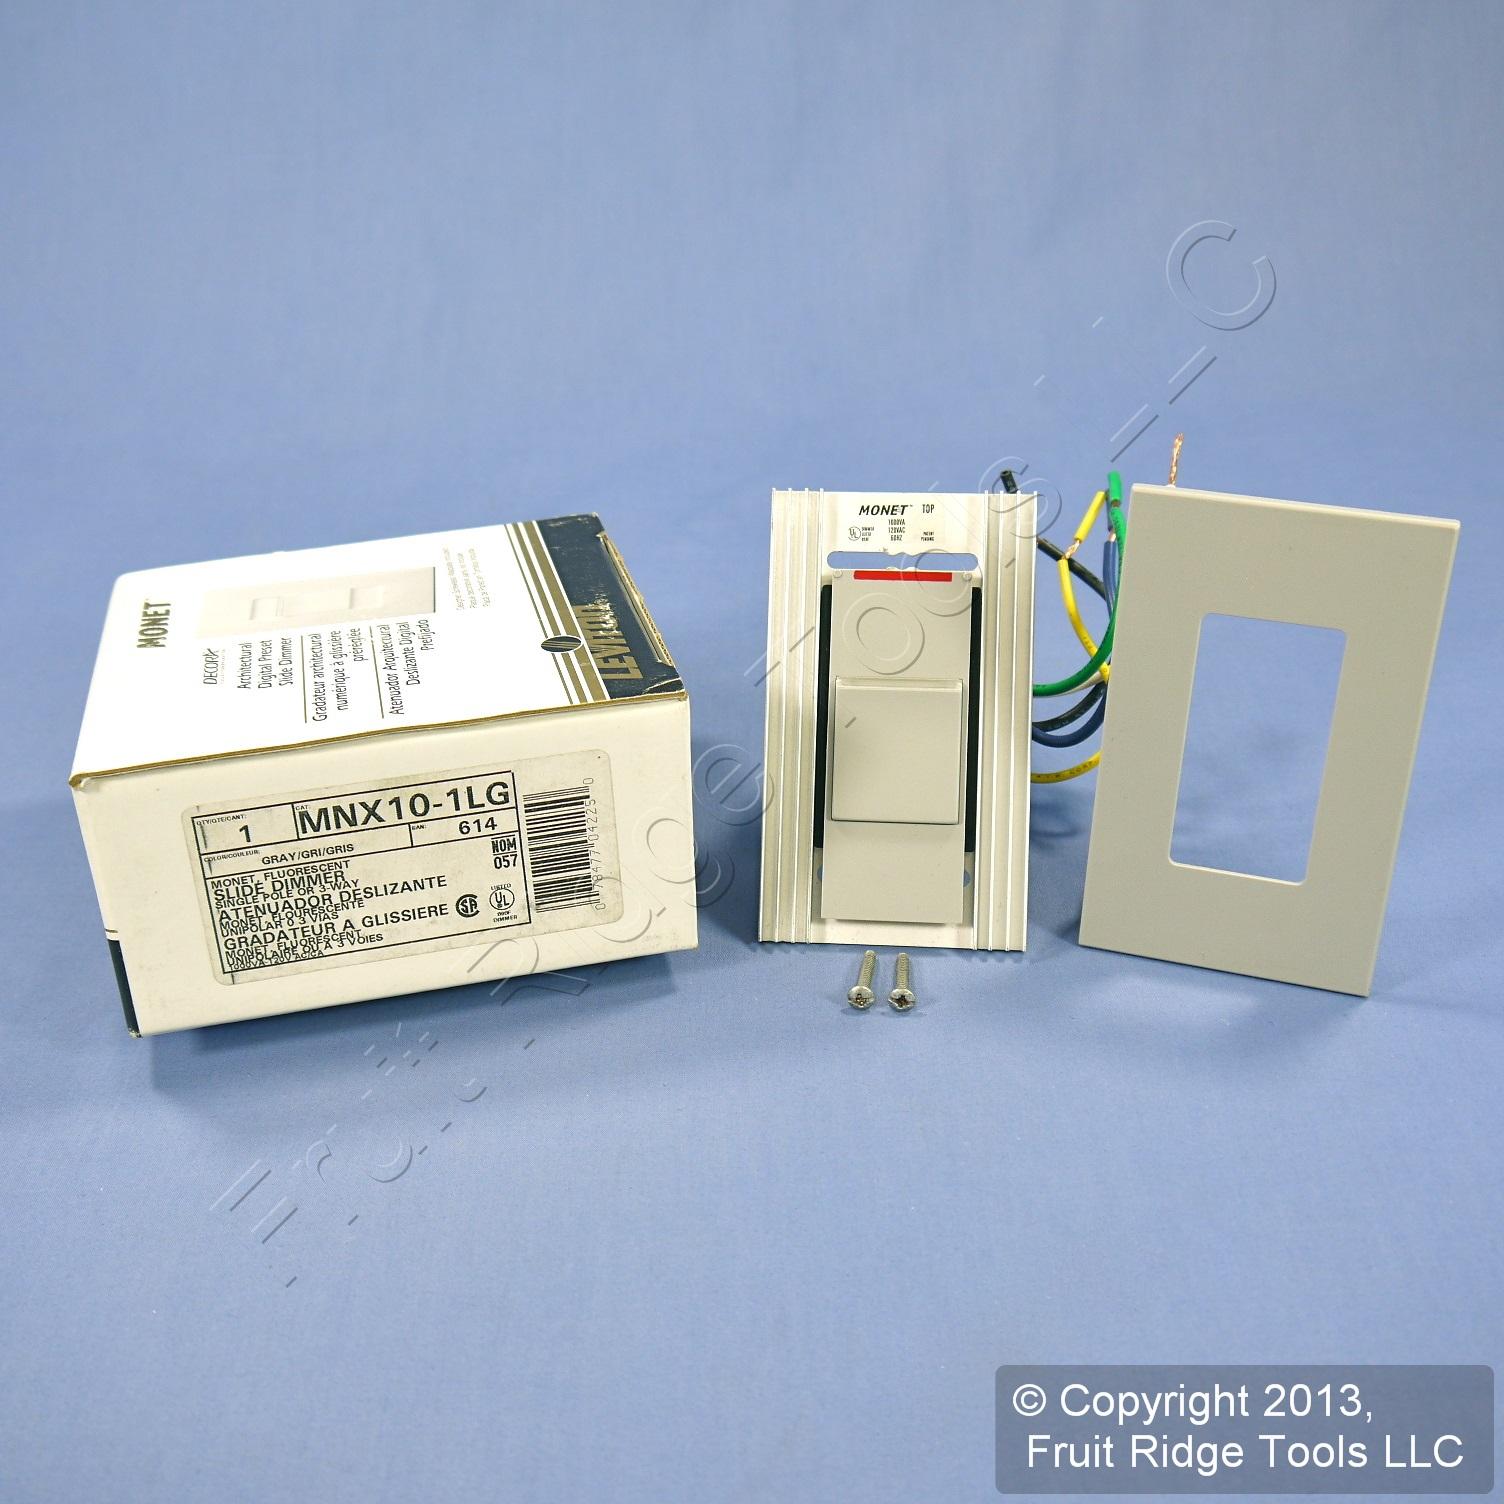 Advance Mark X Dimming Ballast Wiring Diagram: Leviton Gray Monet Fluorescent Slide Light Dimmer Switch